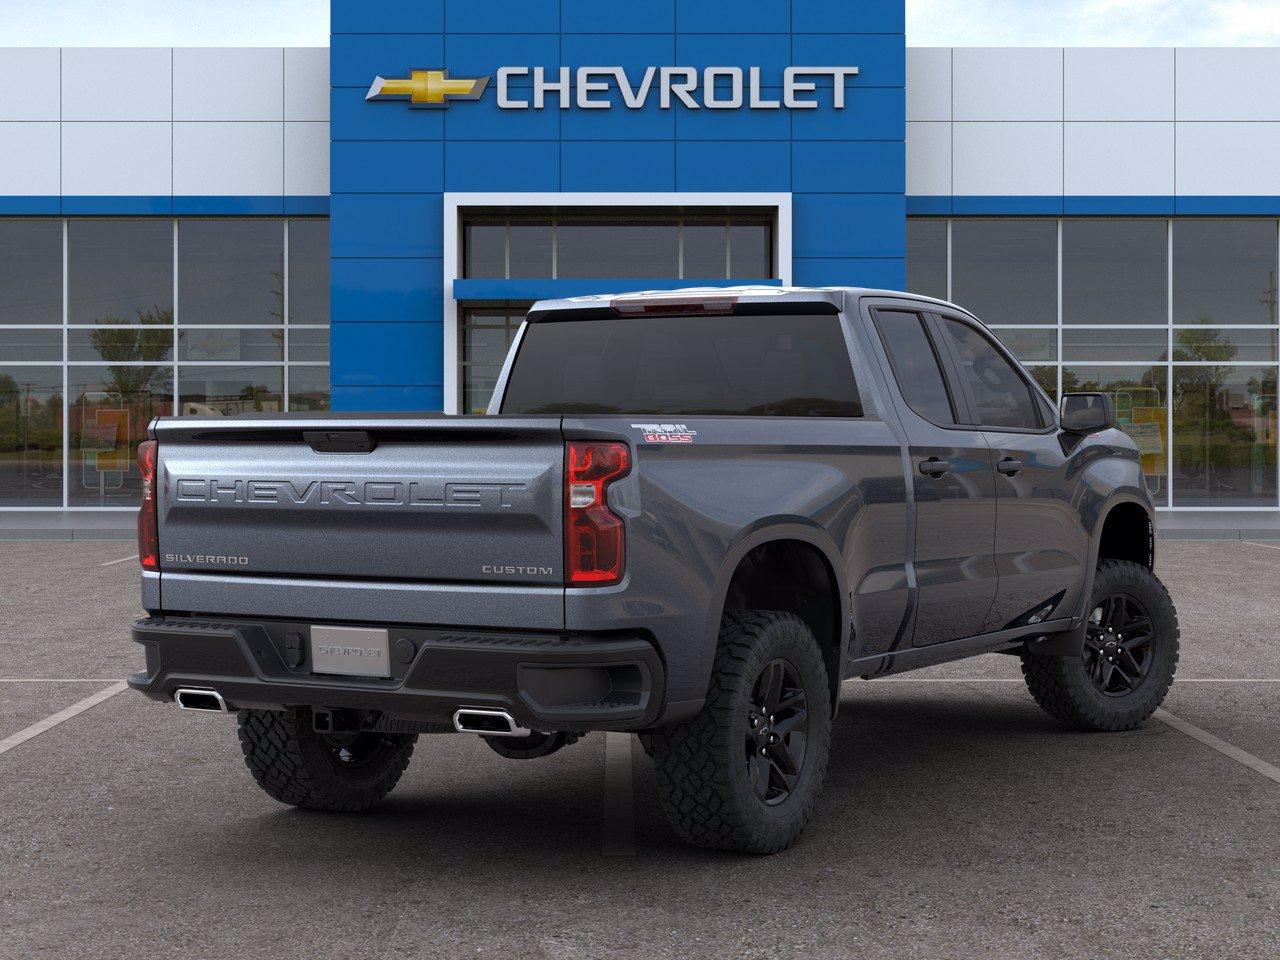 2020 Chevrolet Silverado 1500 Double Cab 4x4, Pickup #C201561 - photo 2